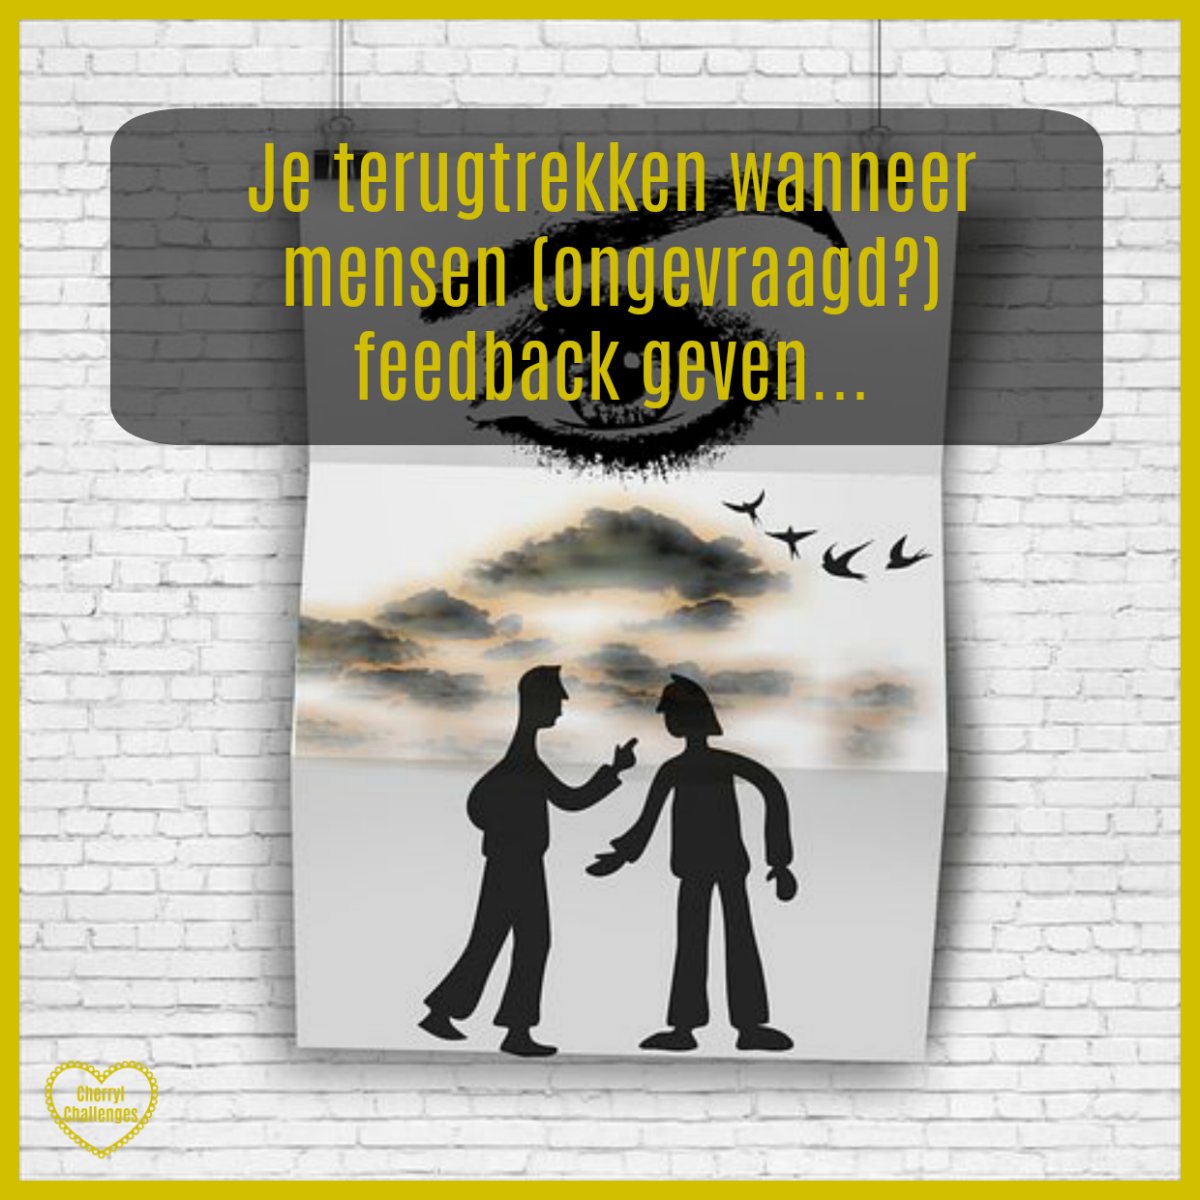 feedback-geven